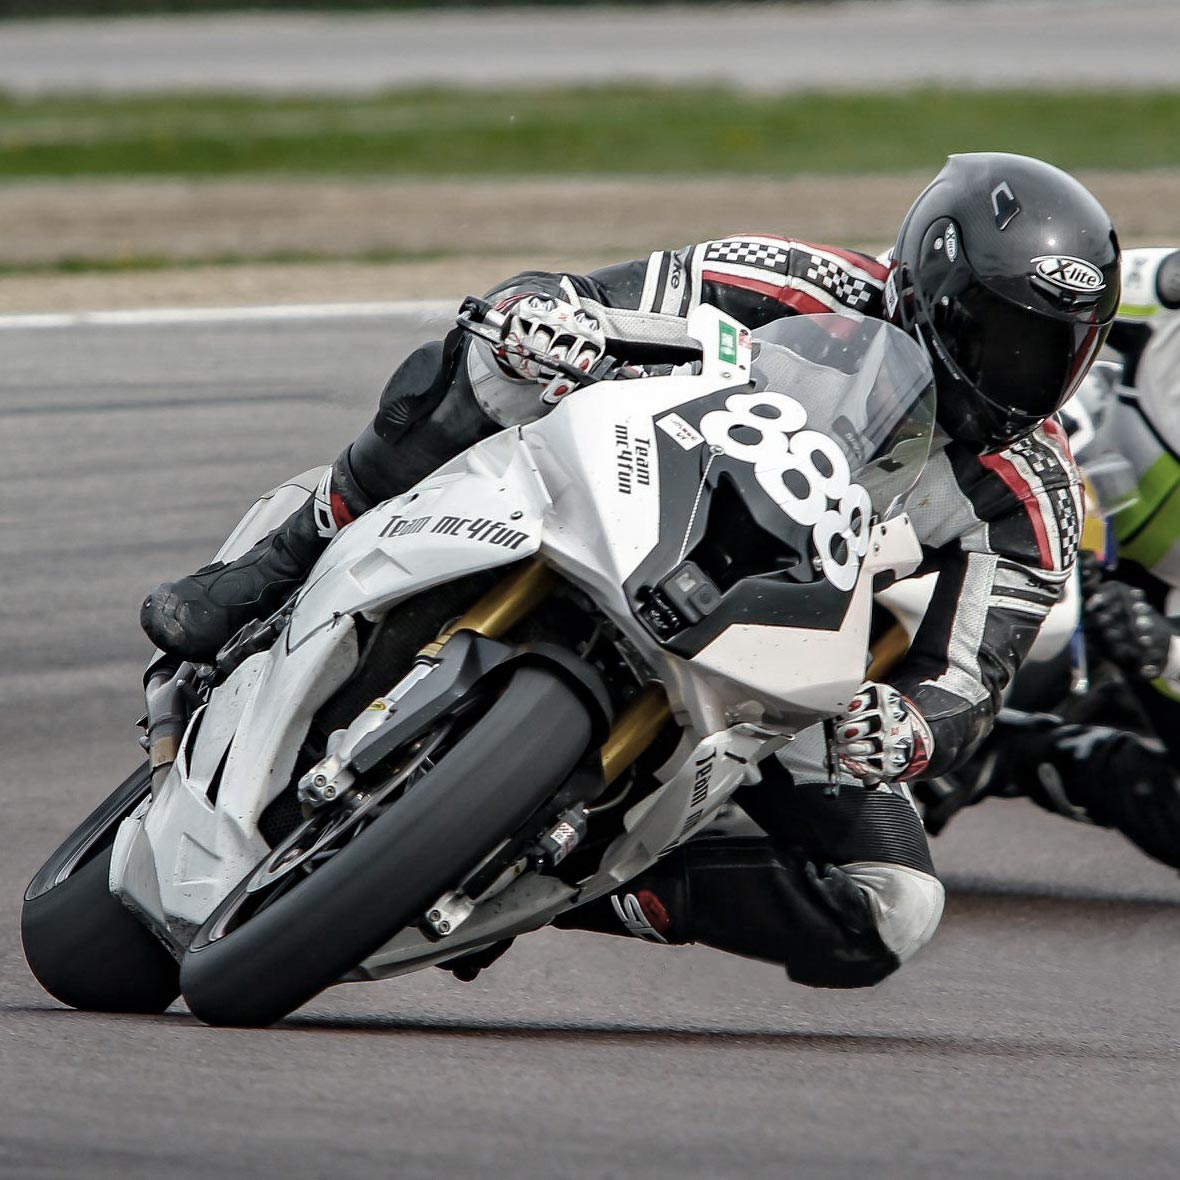 BMW S1000RR - Team mc4fun - Marlon Dixon